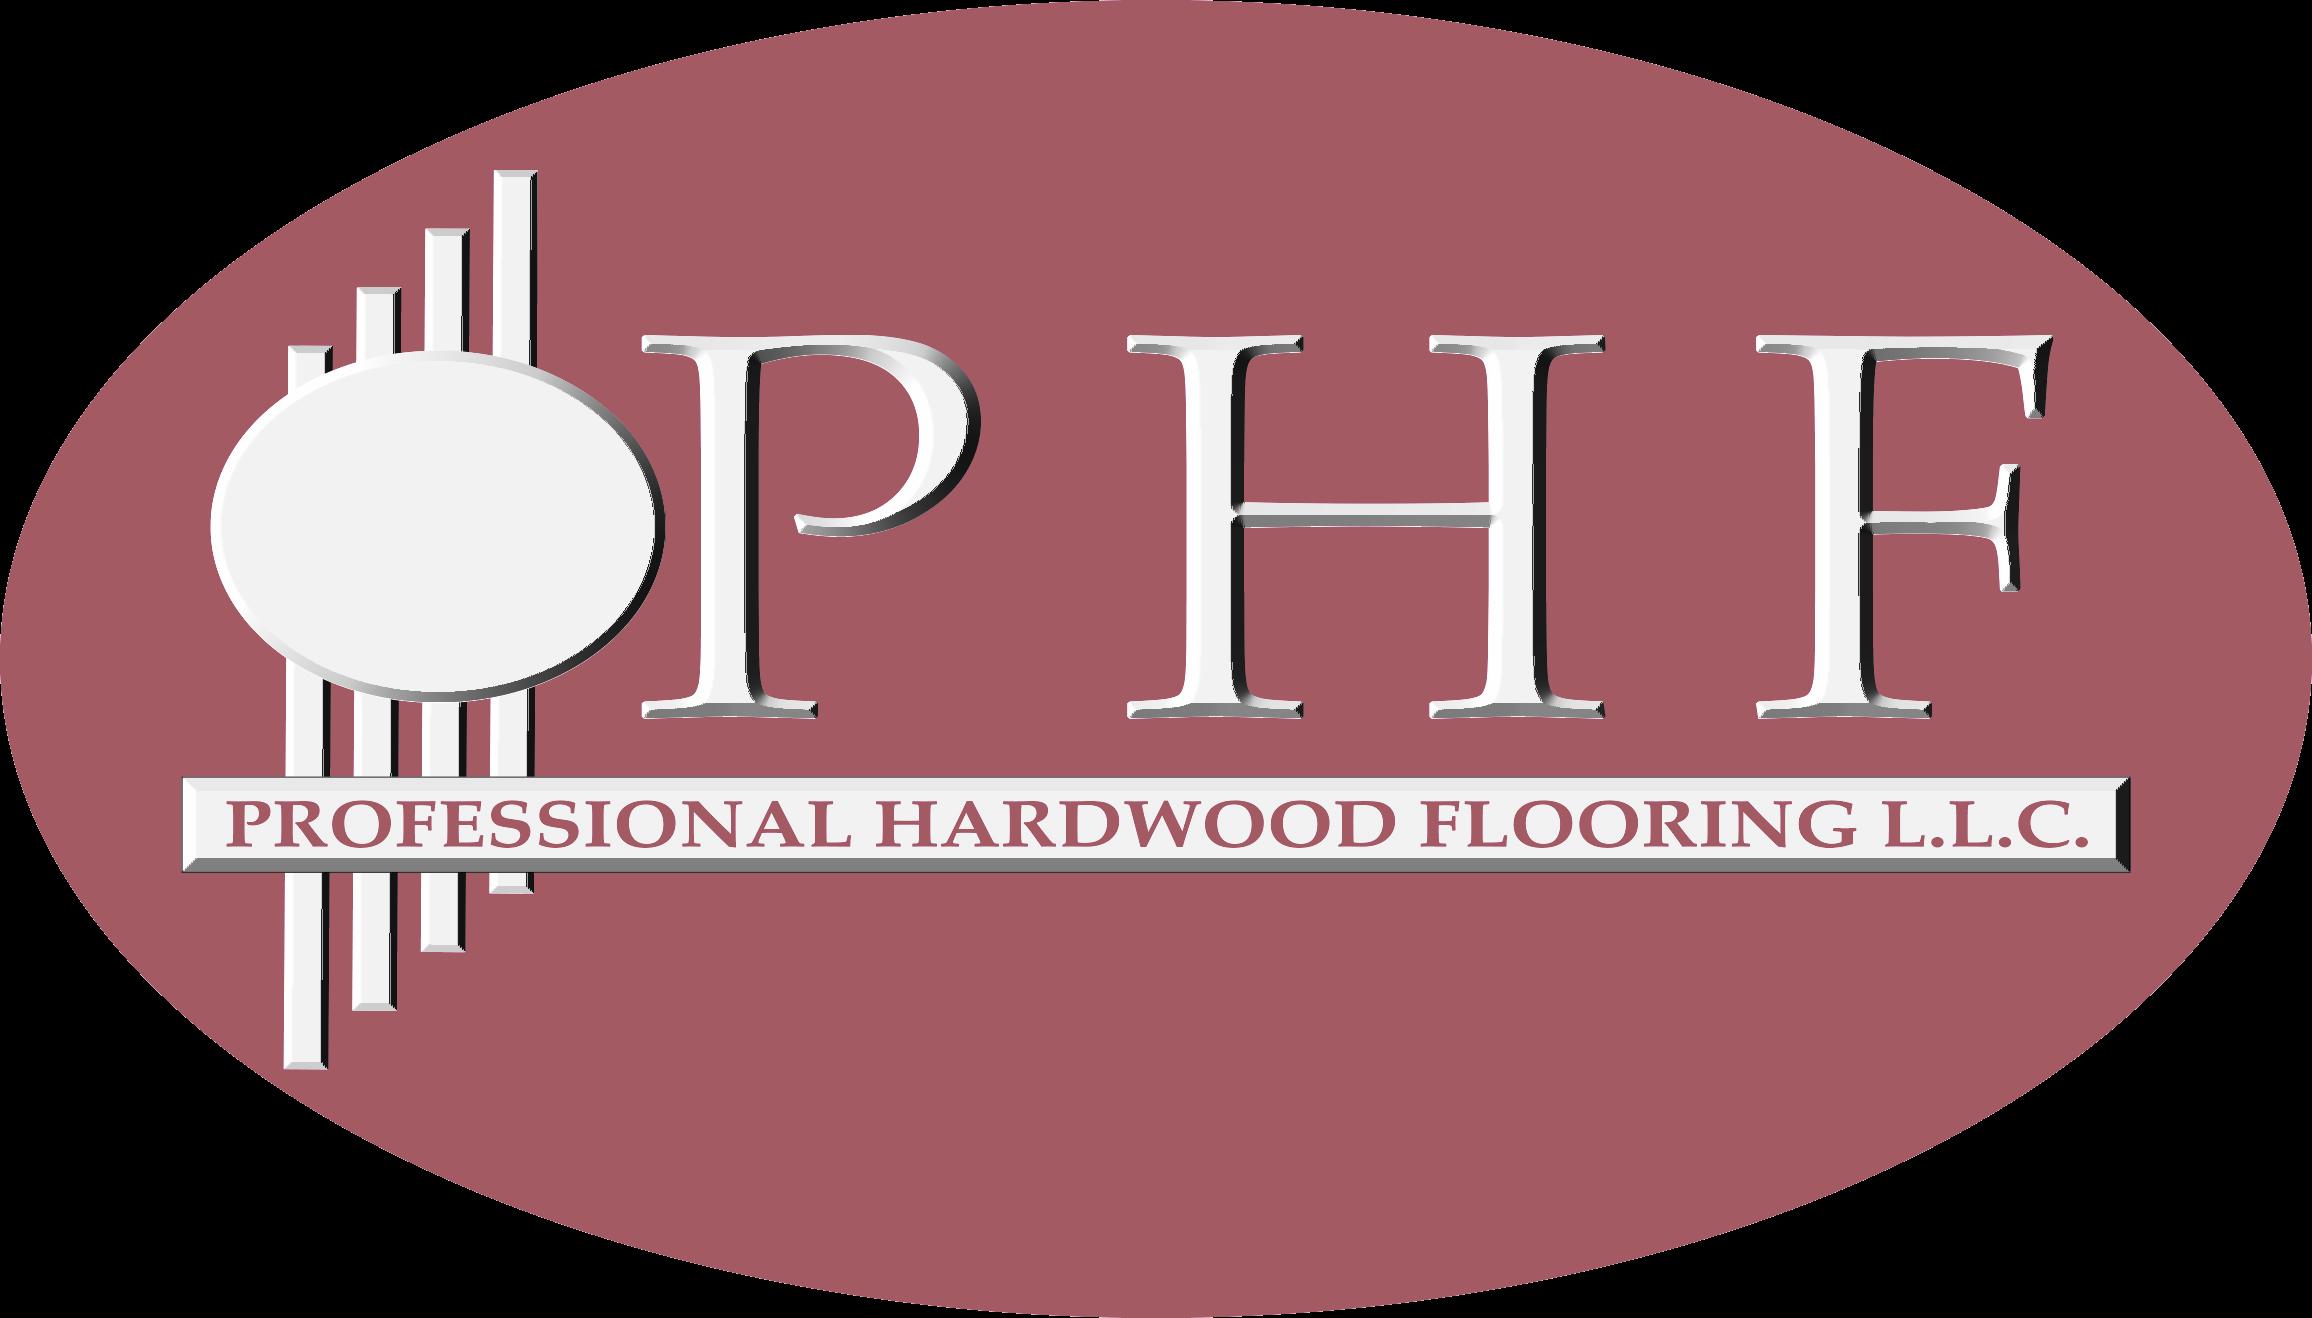 Pro Wood logo Recolor